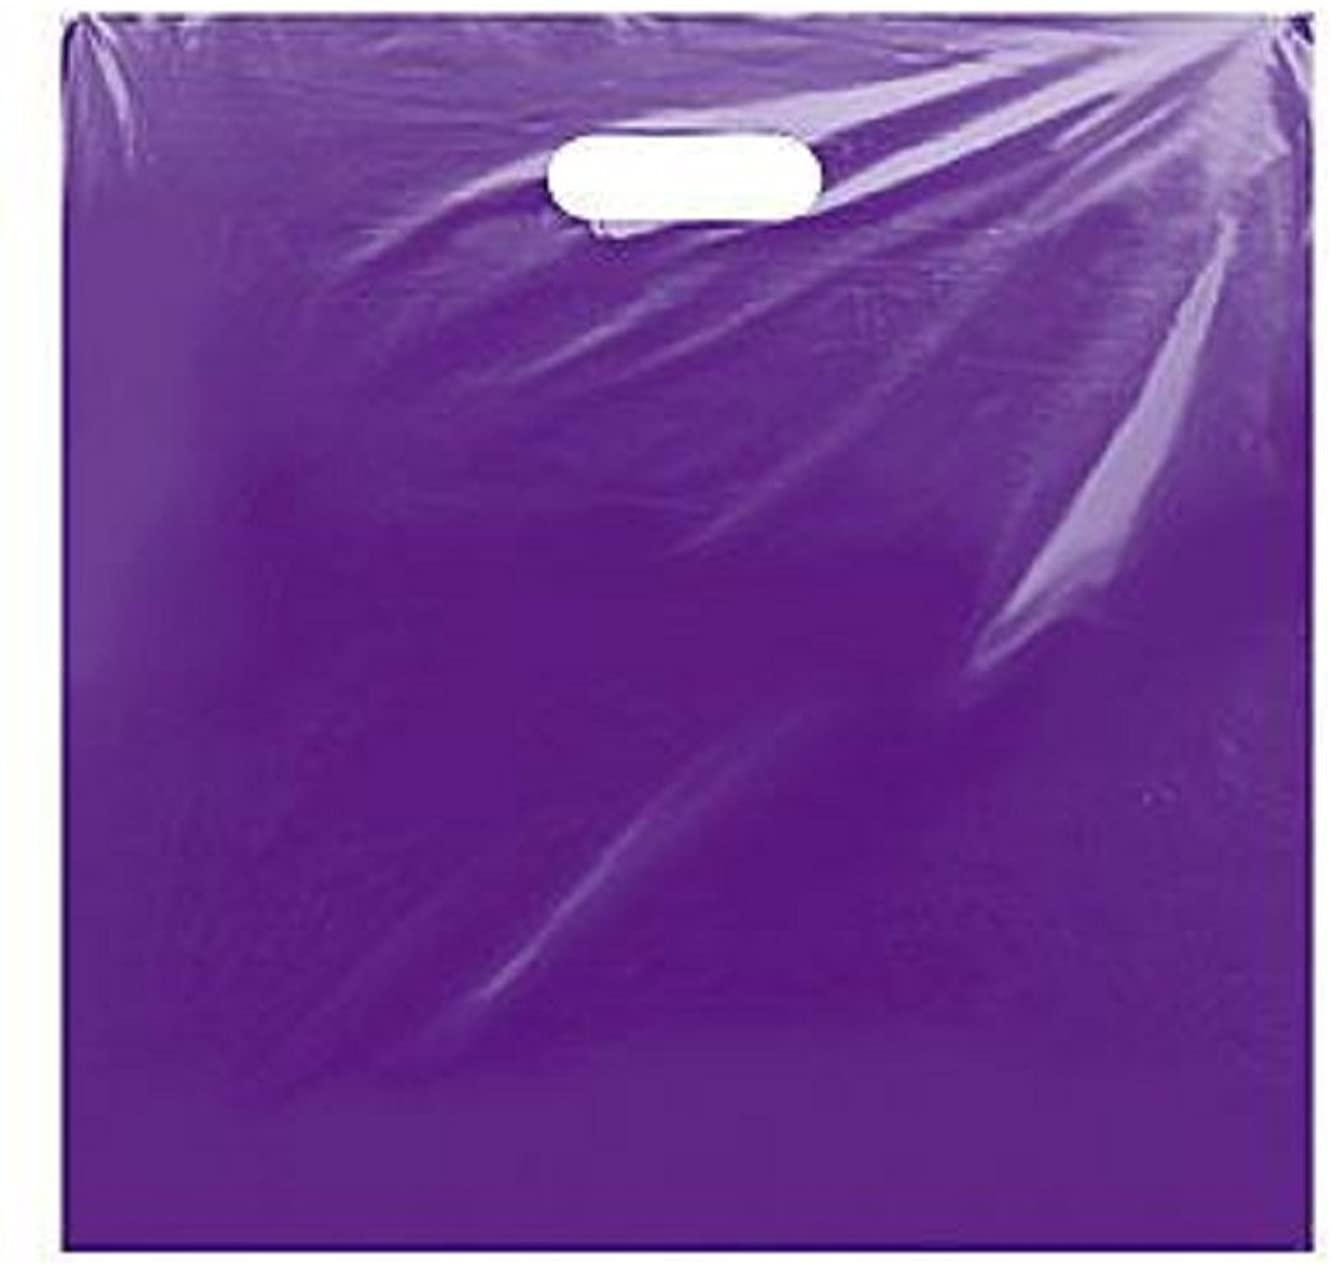 Jumbo Purple Low Density Merchandise Bag 20 x 20 x 5 Case of 500